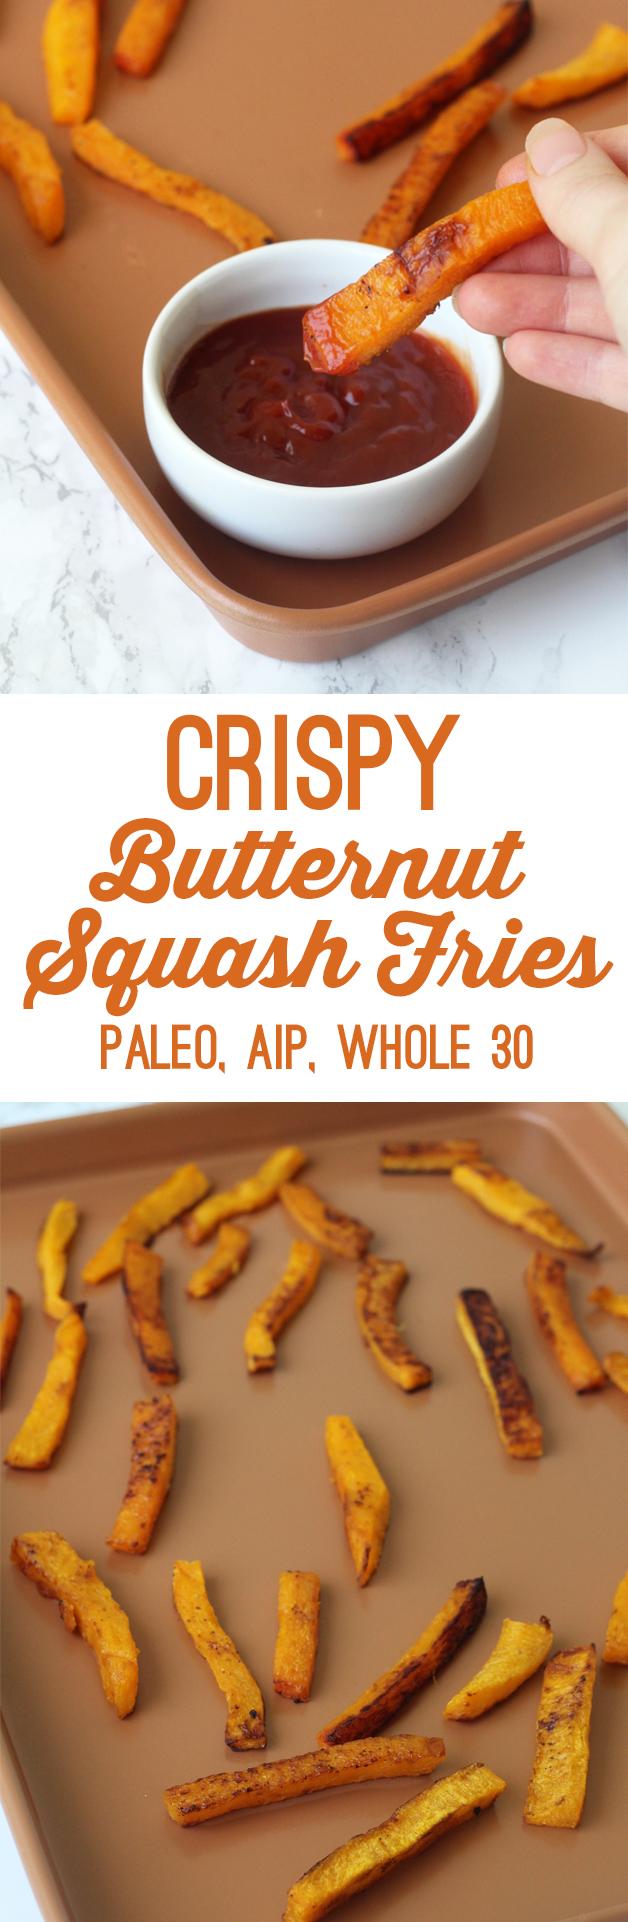 Crispy Butternut Squash Fries (Paleo, Whole 30, AIP)